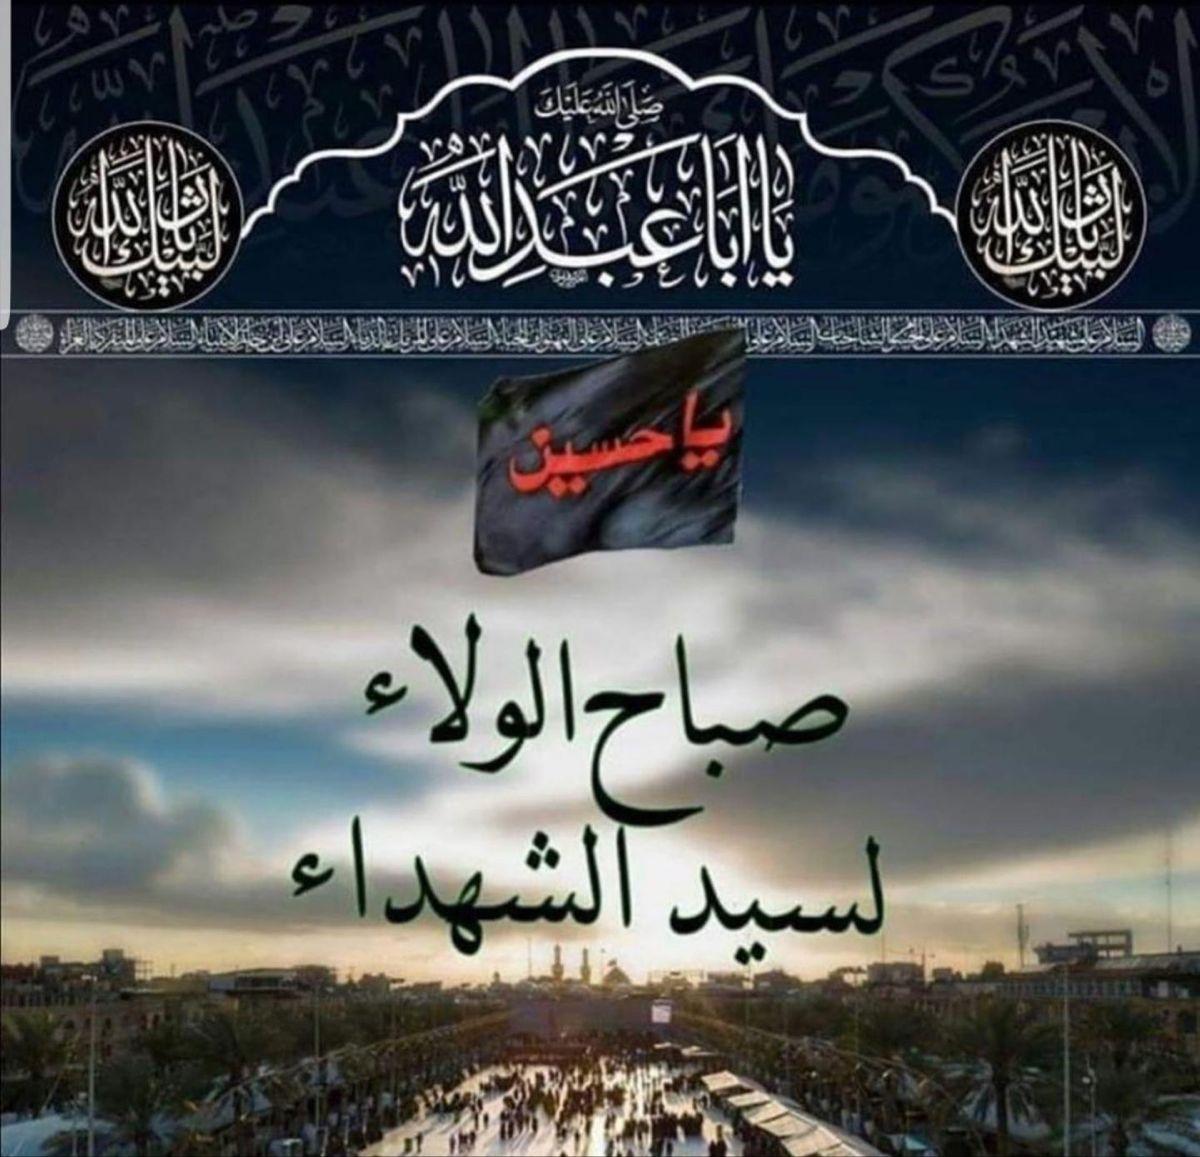 Pin By Diamond Shades On صلوات على محمد واله و صباحياة Whatsapp Profile Picture Islamic Pictures Profile Picture